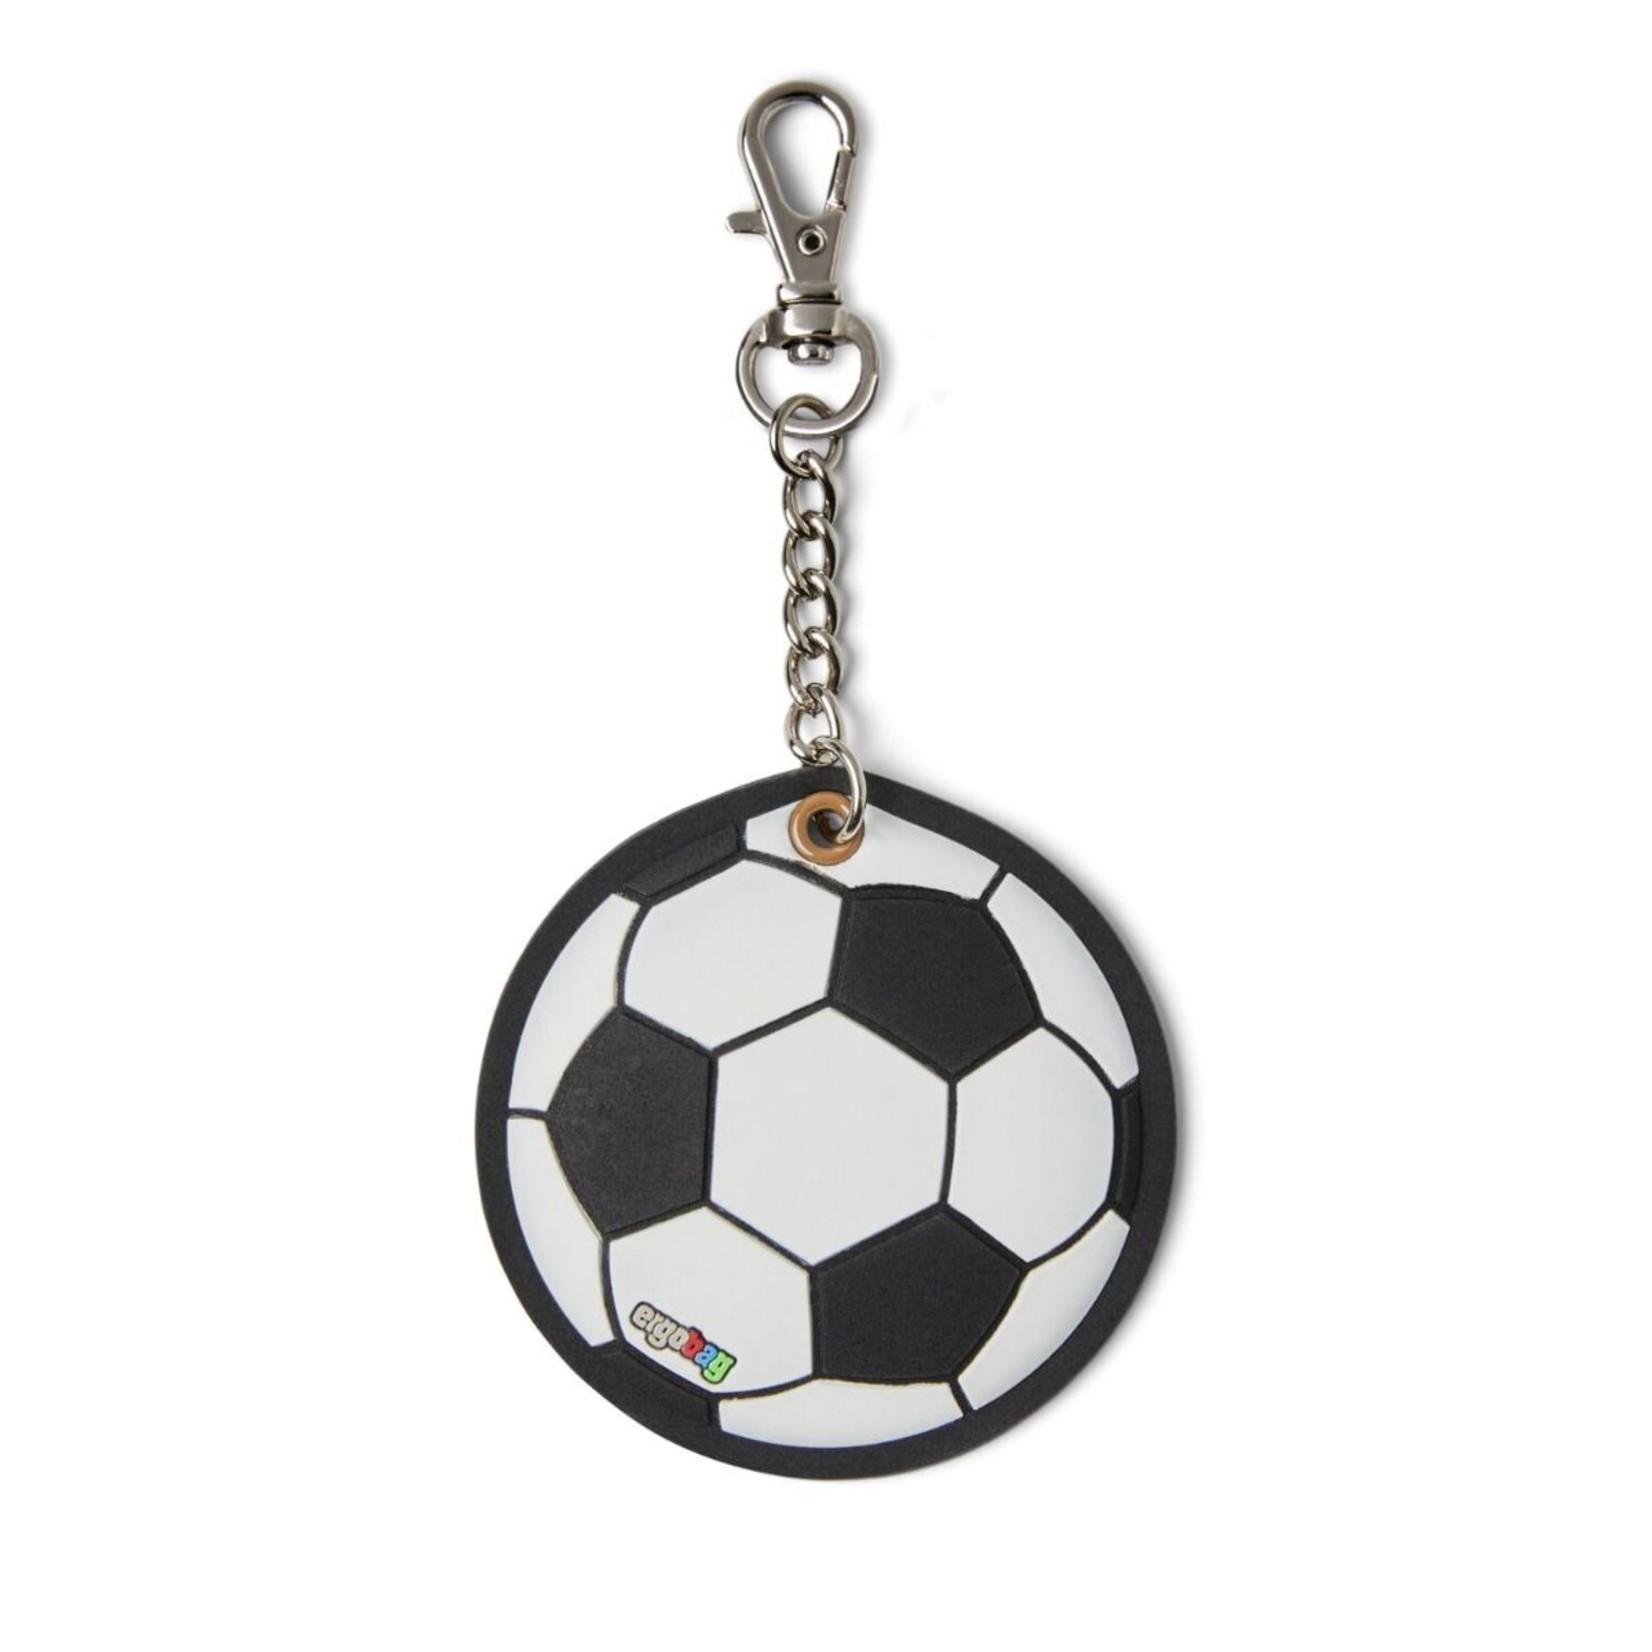 ERGOBAG Hangies Fußball